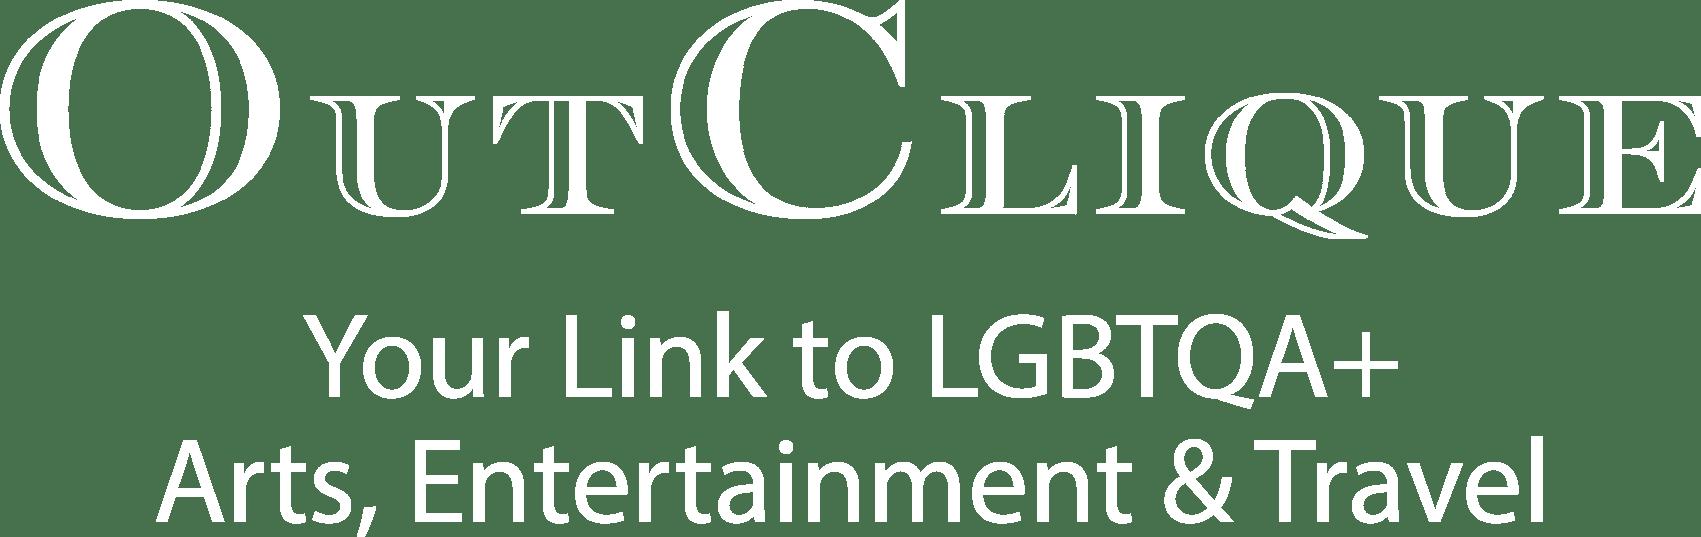 OCQ Mag Logo_2021_W